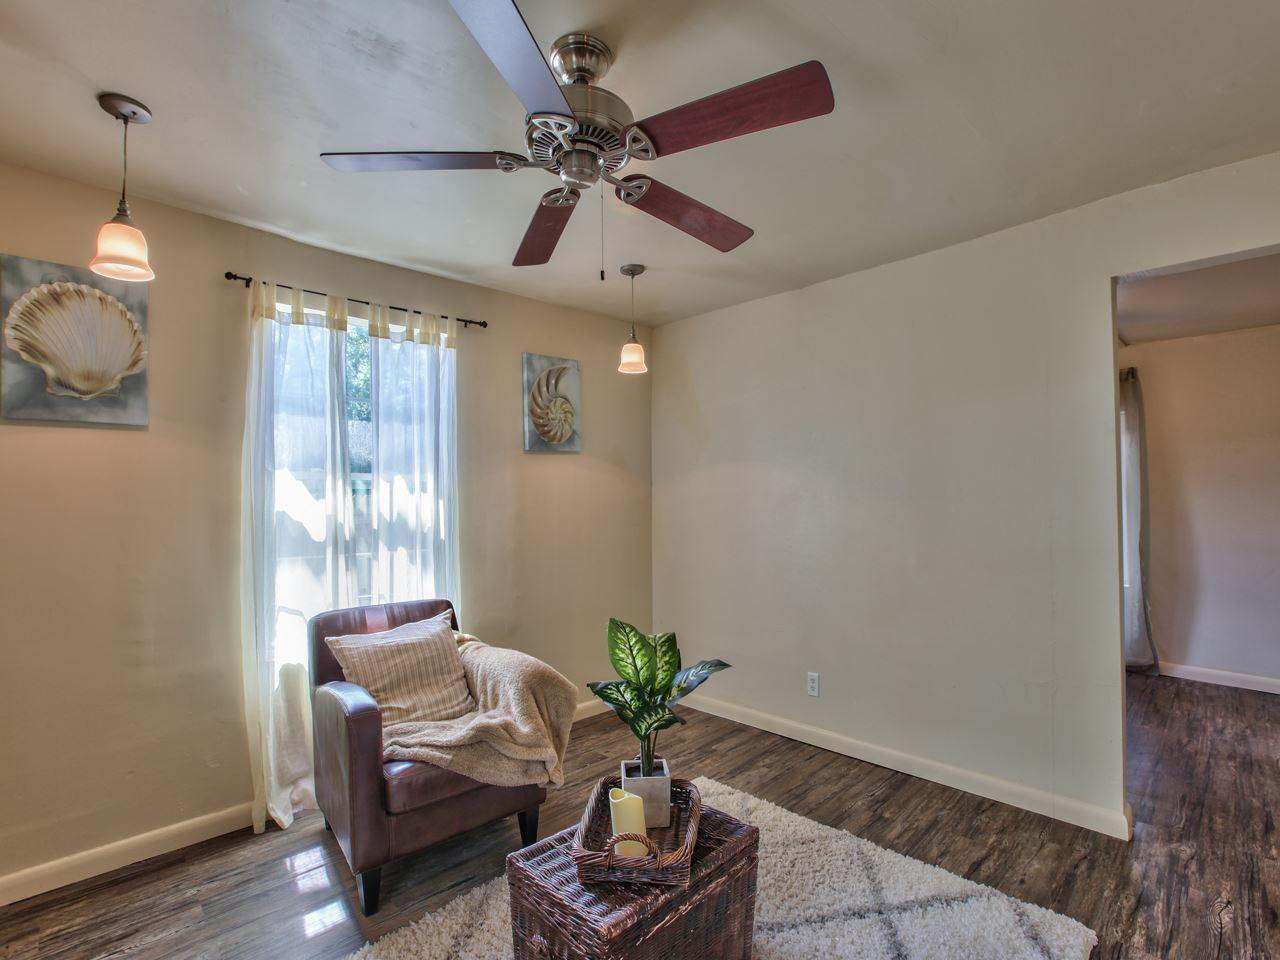 Photo of 817 CROSSWAY Road, TALLAHASSEE, FL 32305 (MLS # 319350)